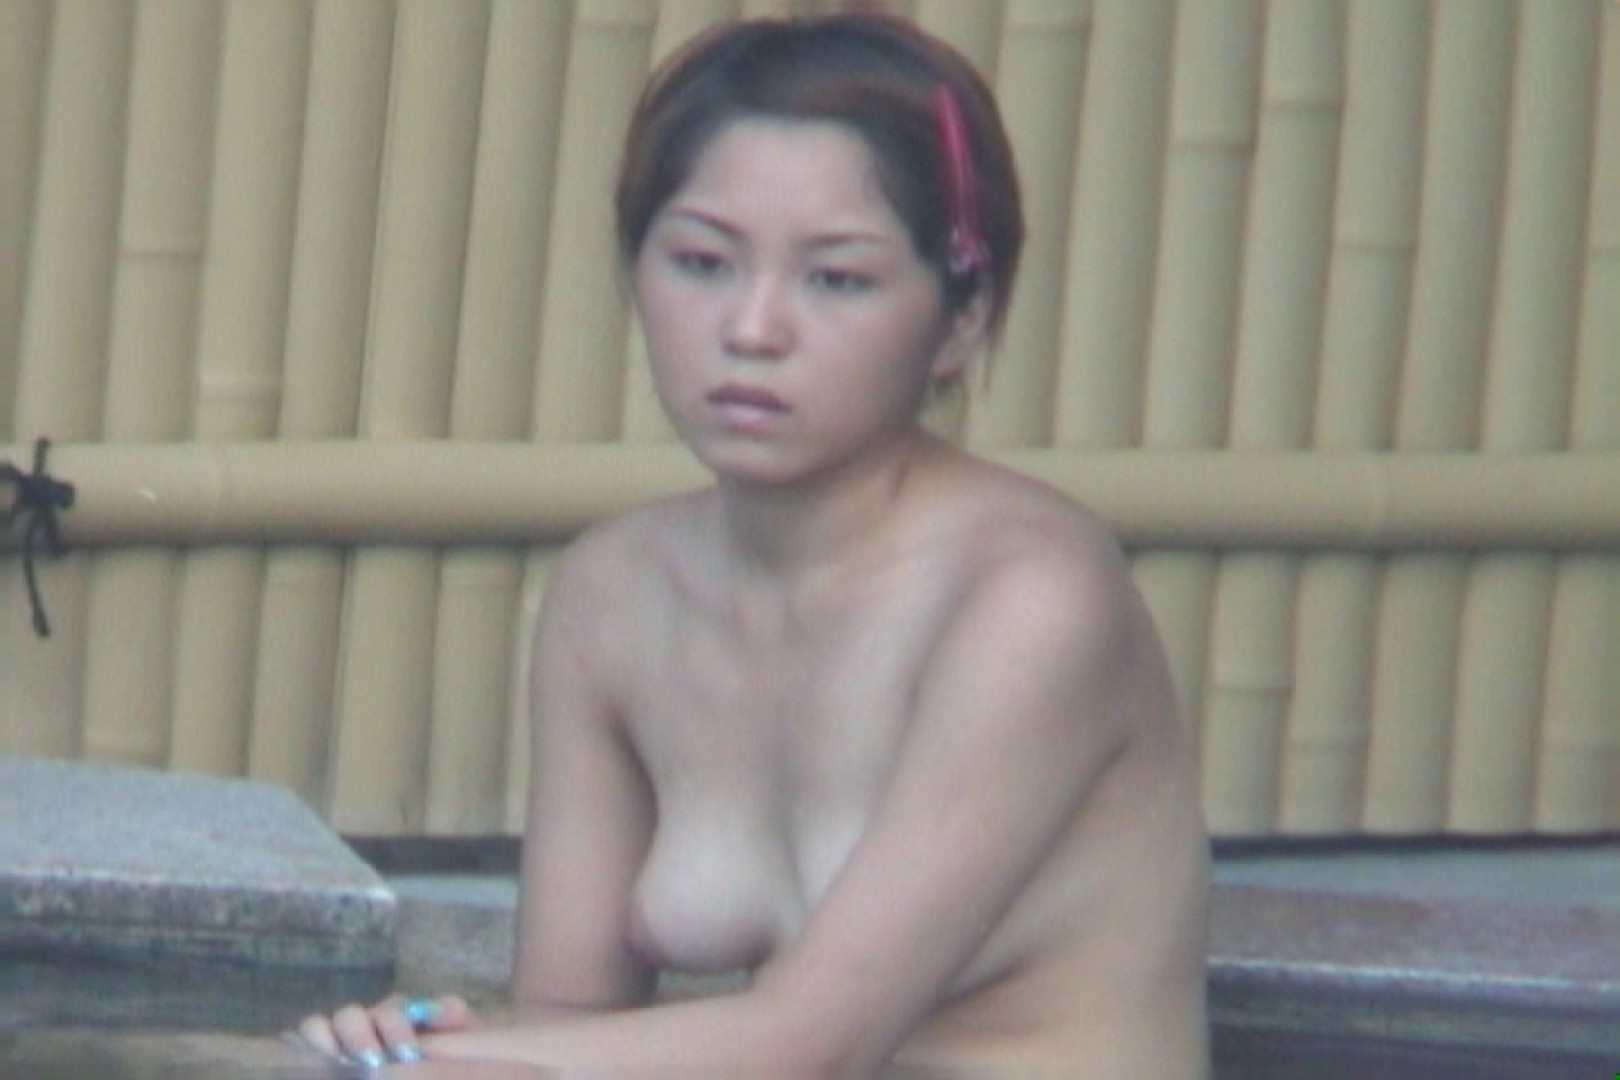 Aquaな露天風呂Vol.574 盗撮シリーズ | 露天風呂編  87PIX 67